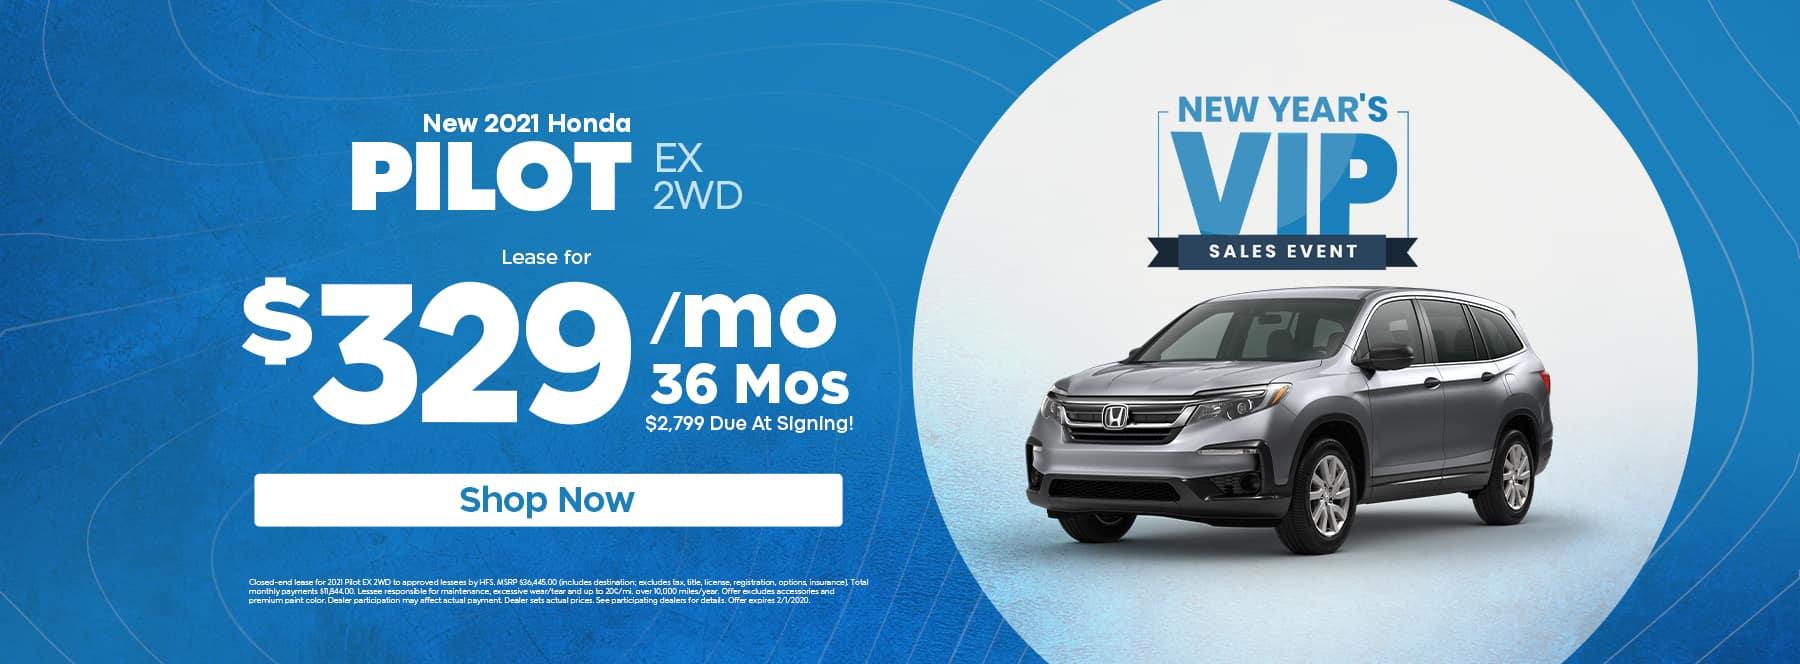 2021 Honda Pilot EX 2WD - Alpharetta, GA